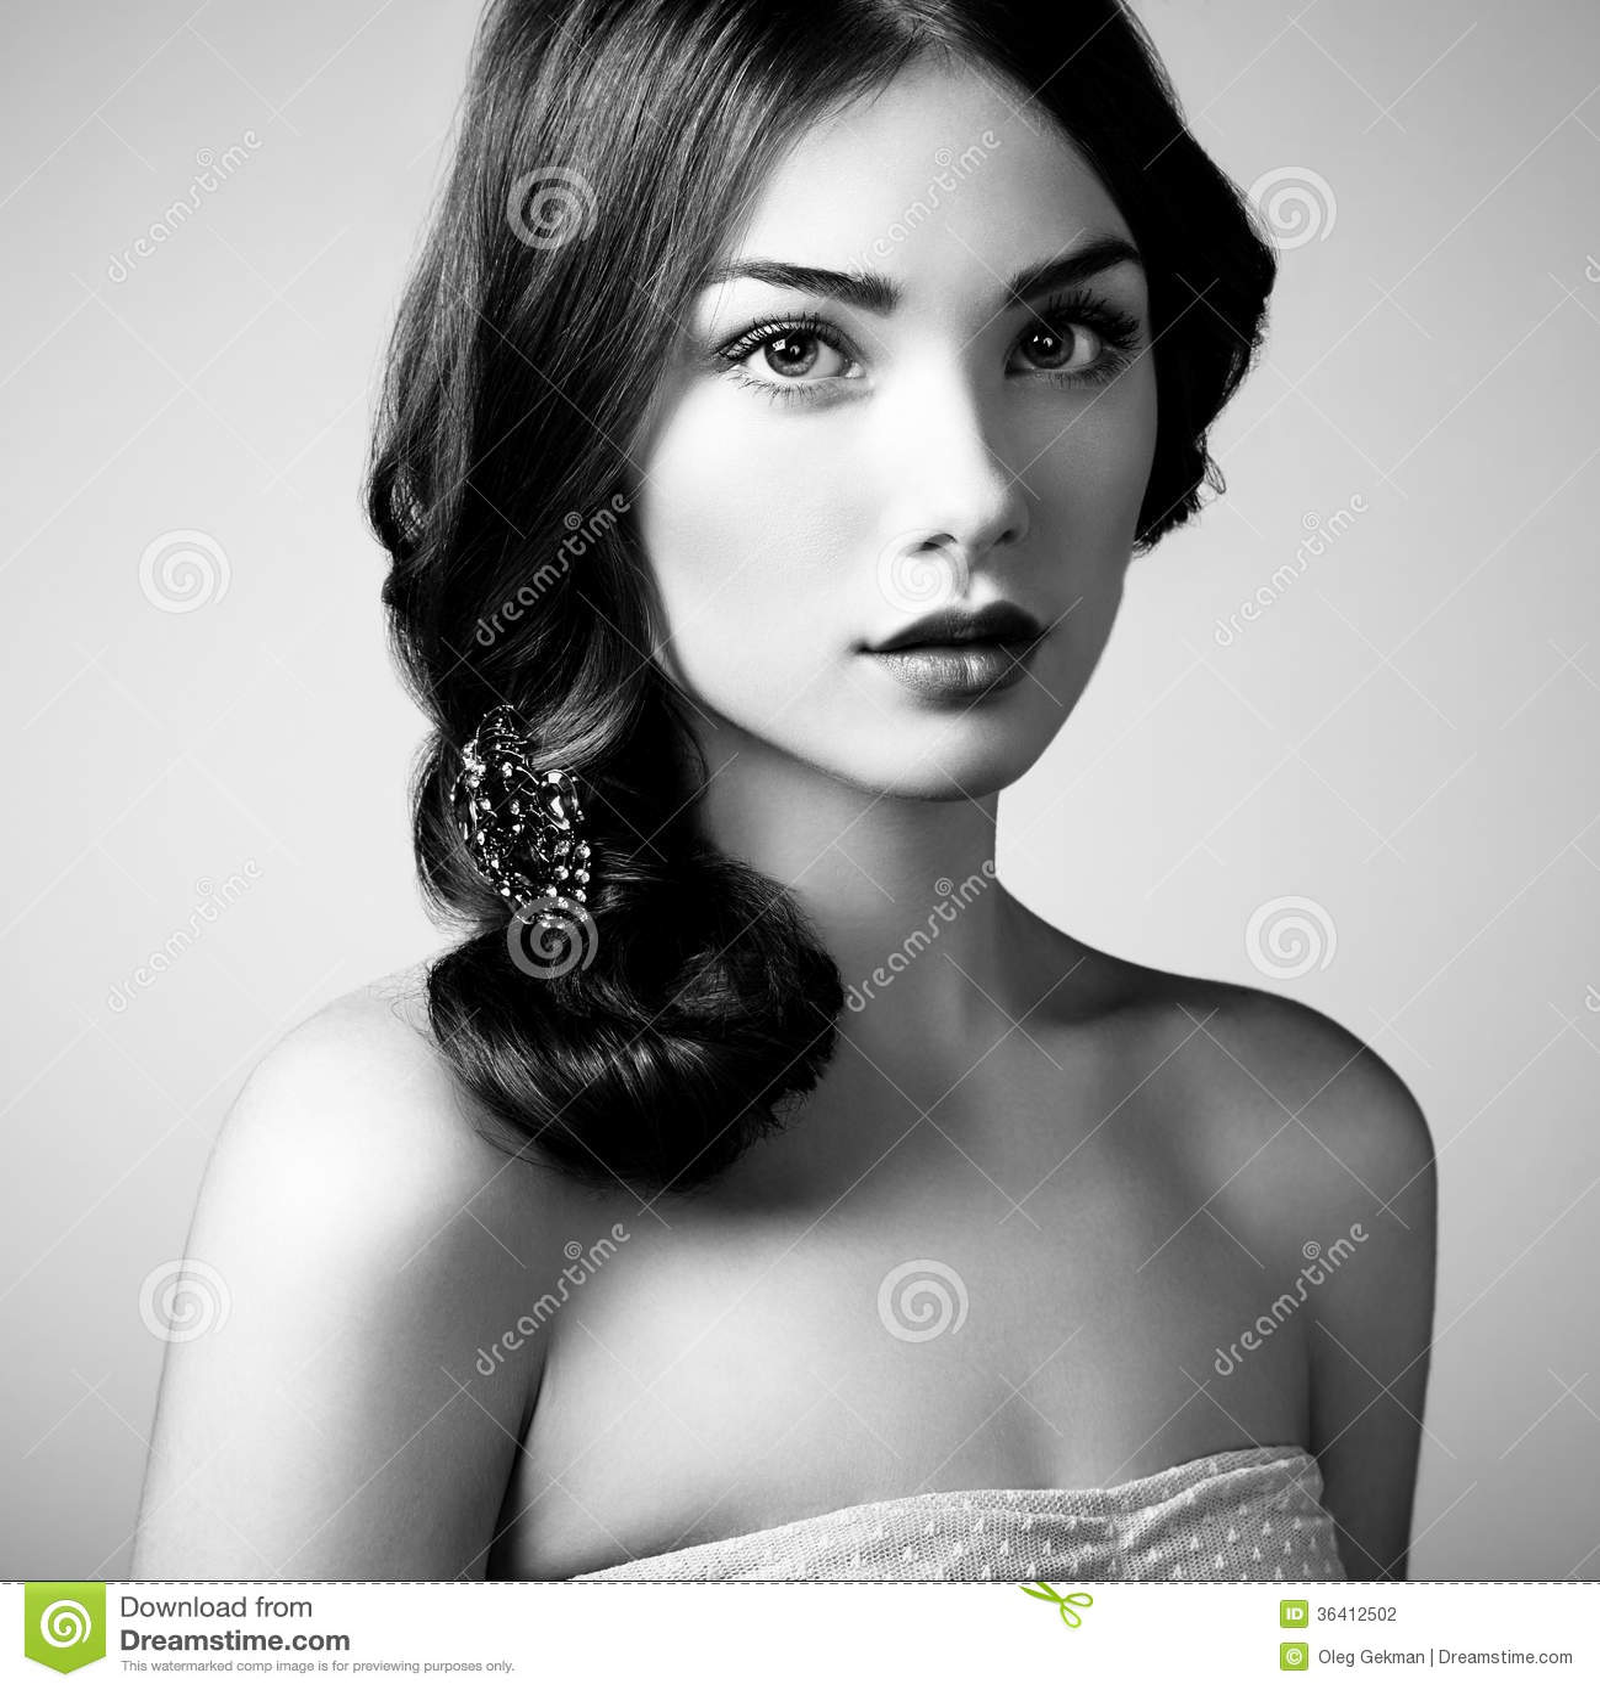 Available Light Portrait-boy'-s &- girl'-s - Images | VINOD KHAPEKAR ...